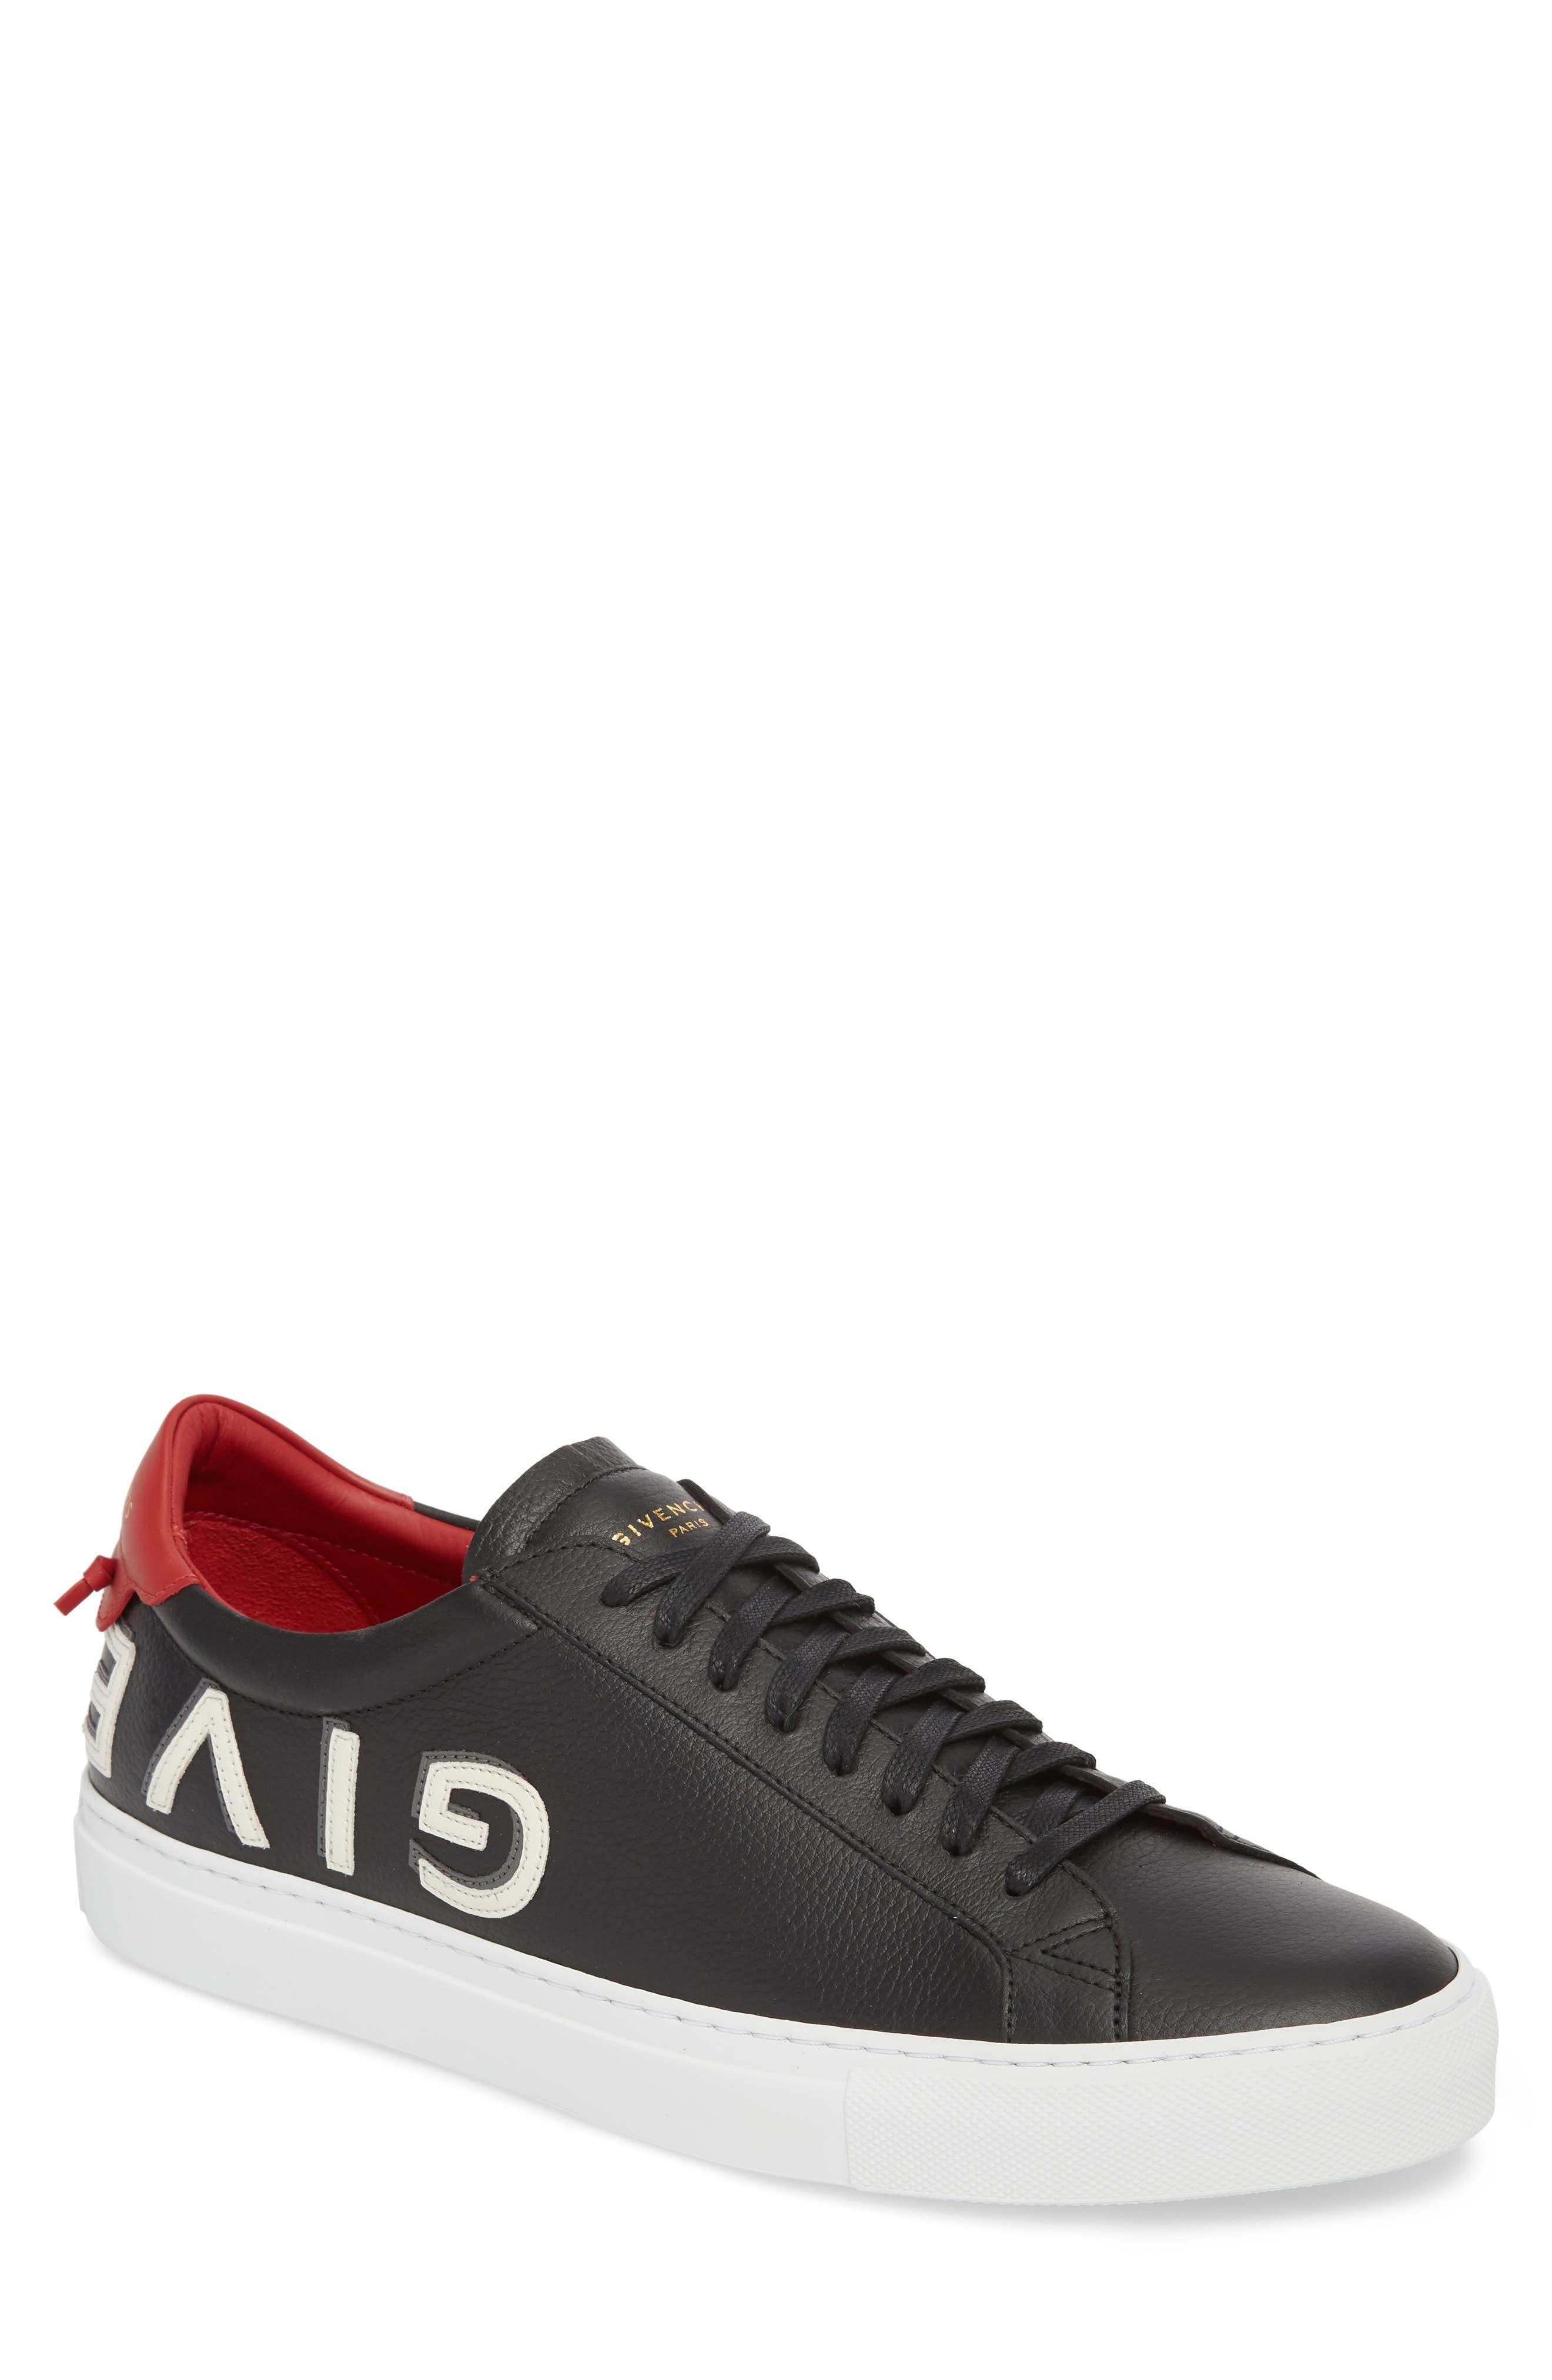 Urban Street Upside Down Sneaker,                             Main thumbnail 1, color,                             Black/ Red